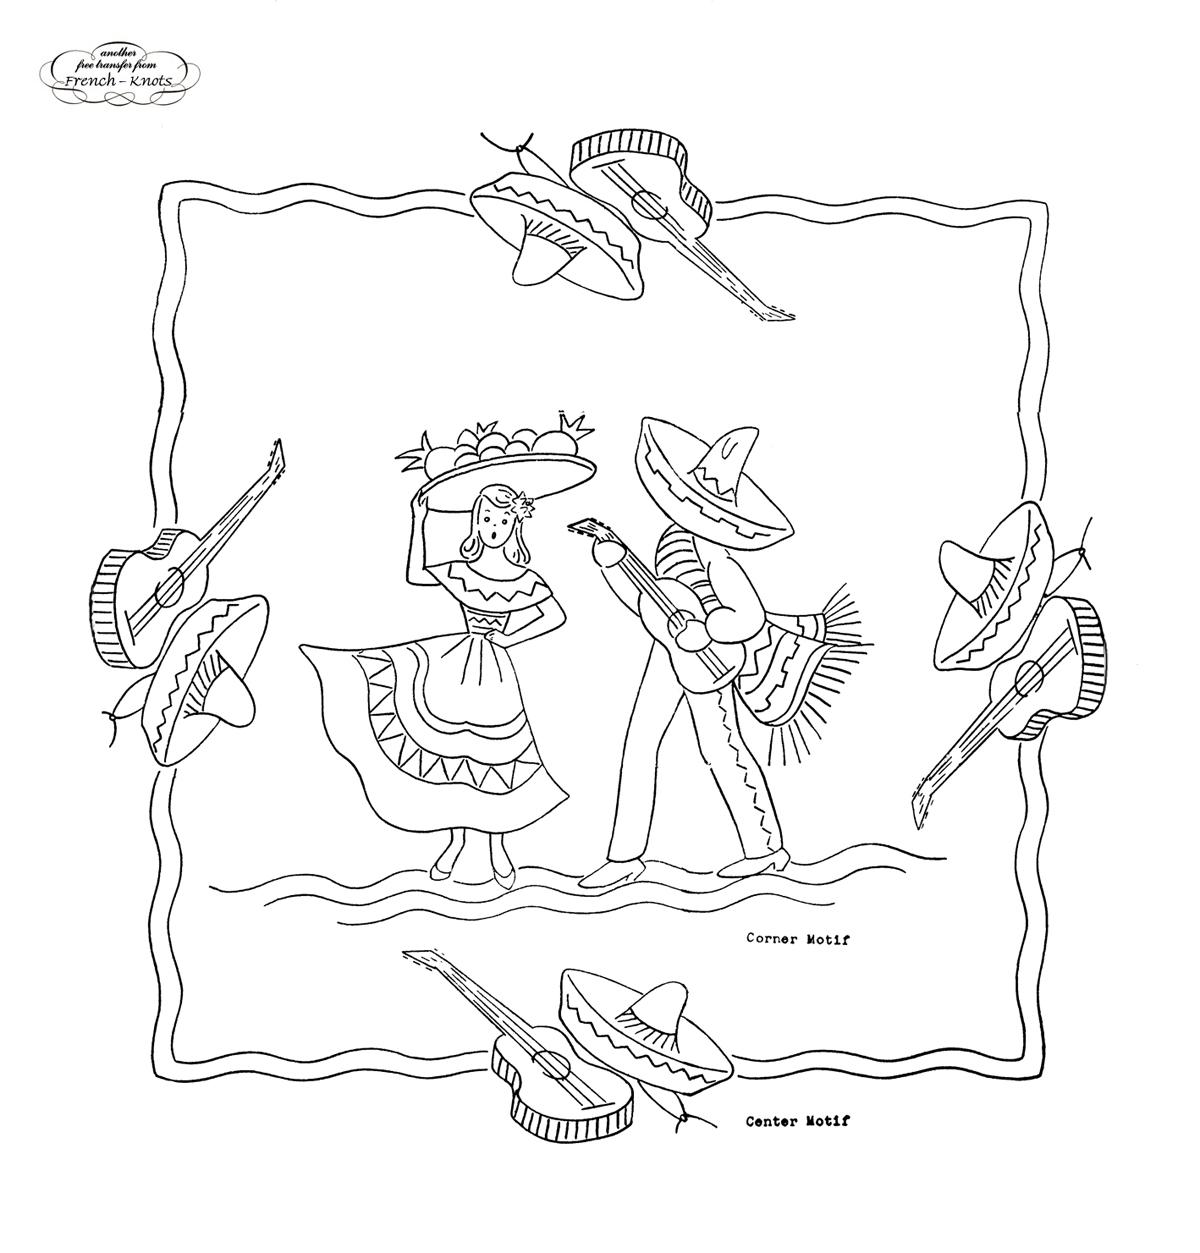 Vintage Embroidery Patterns Cool Design Inspiration